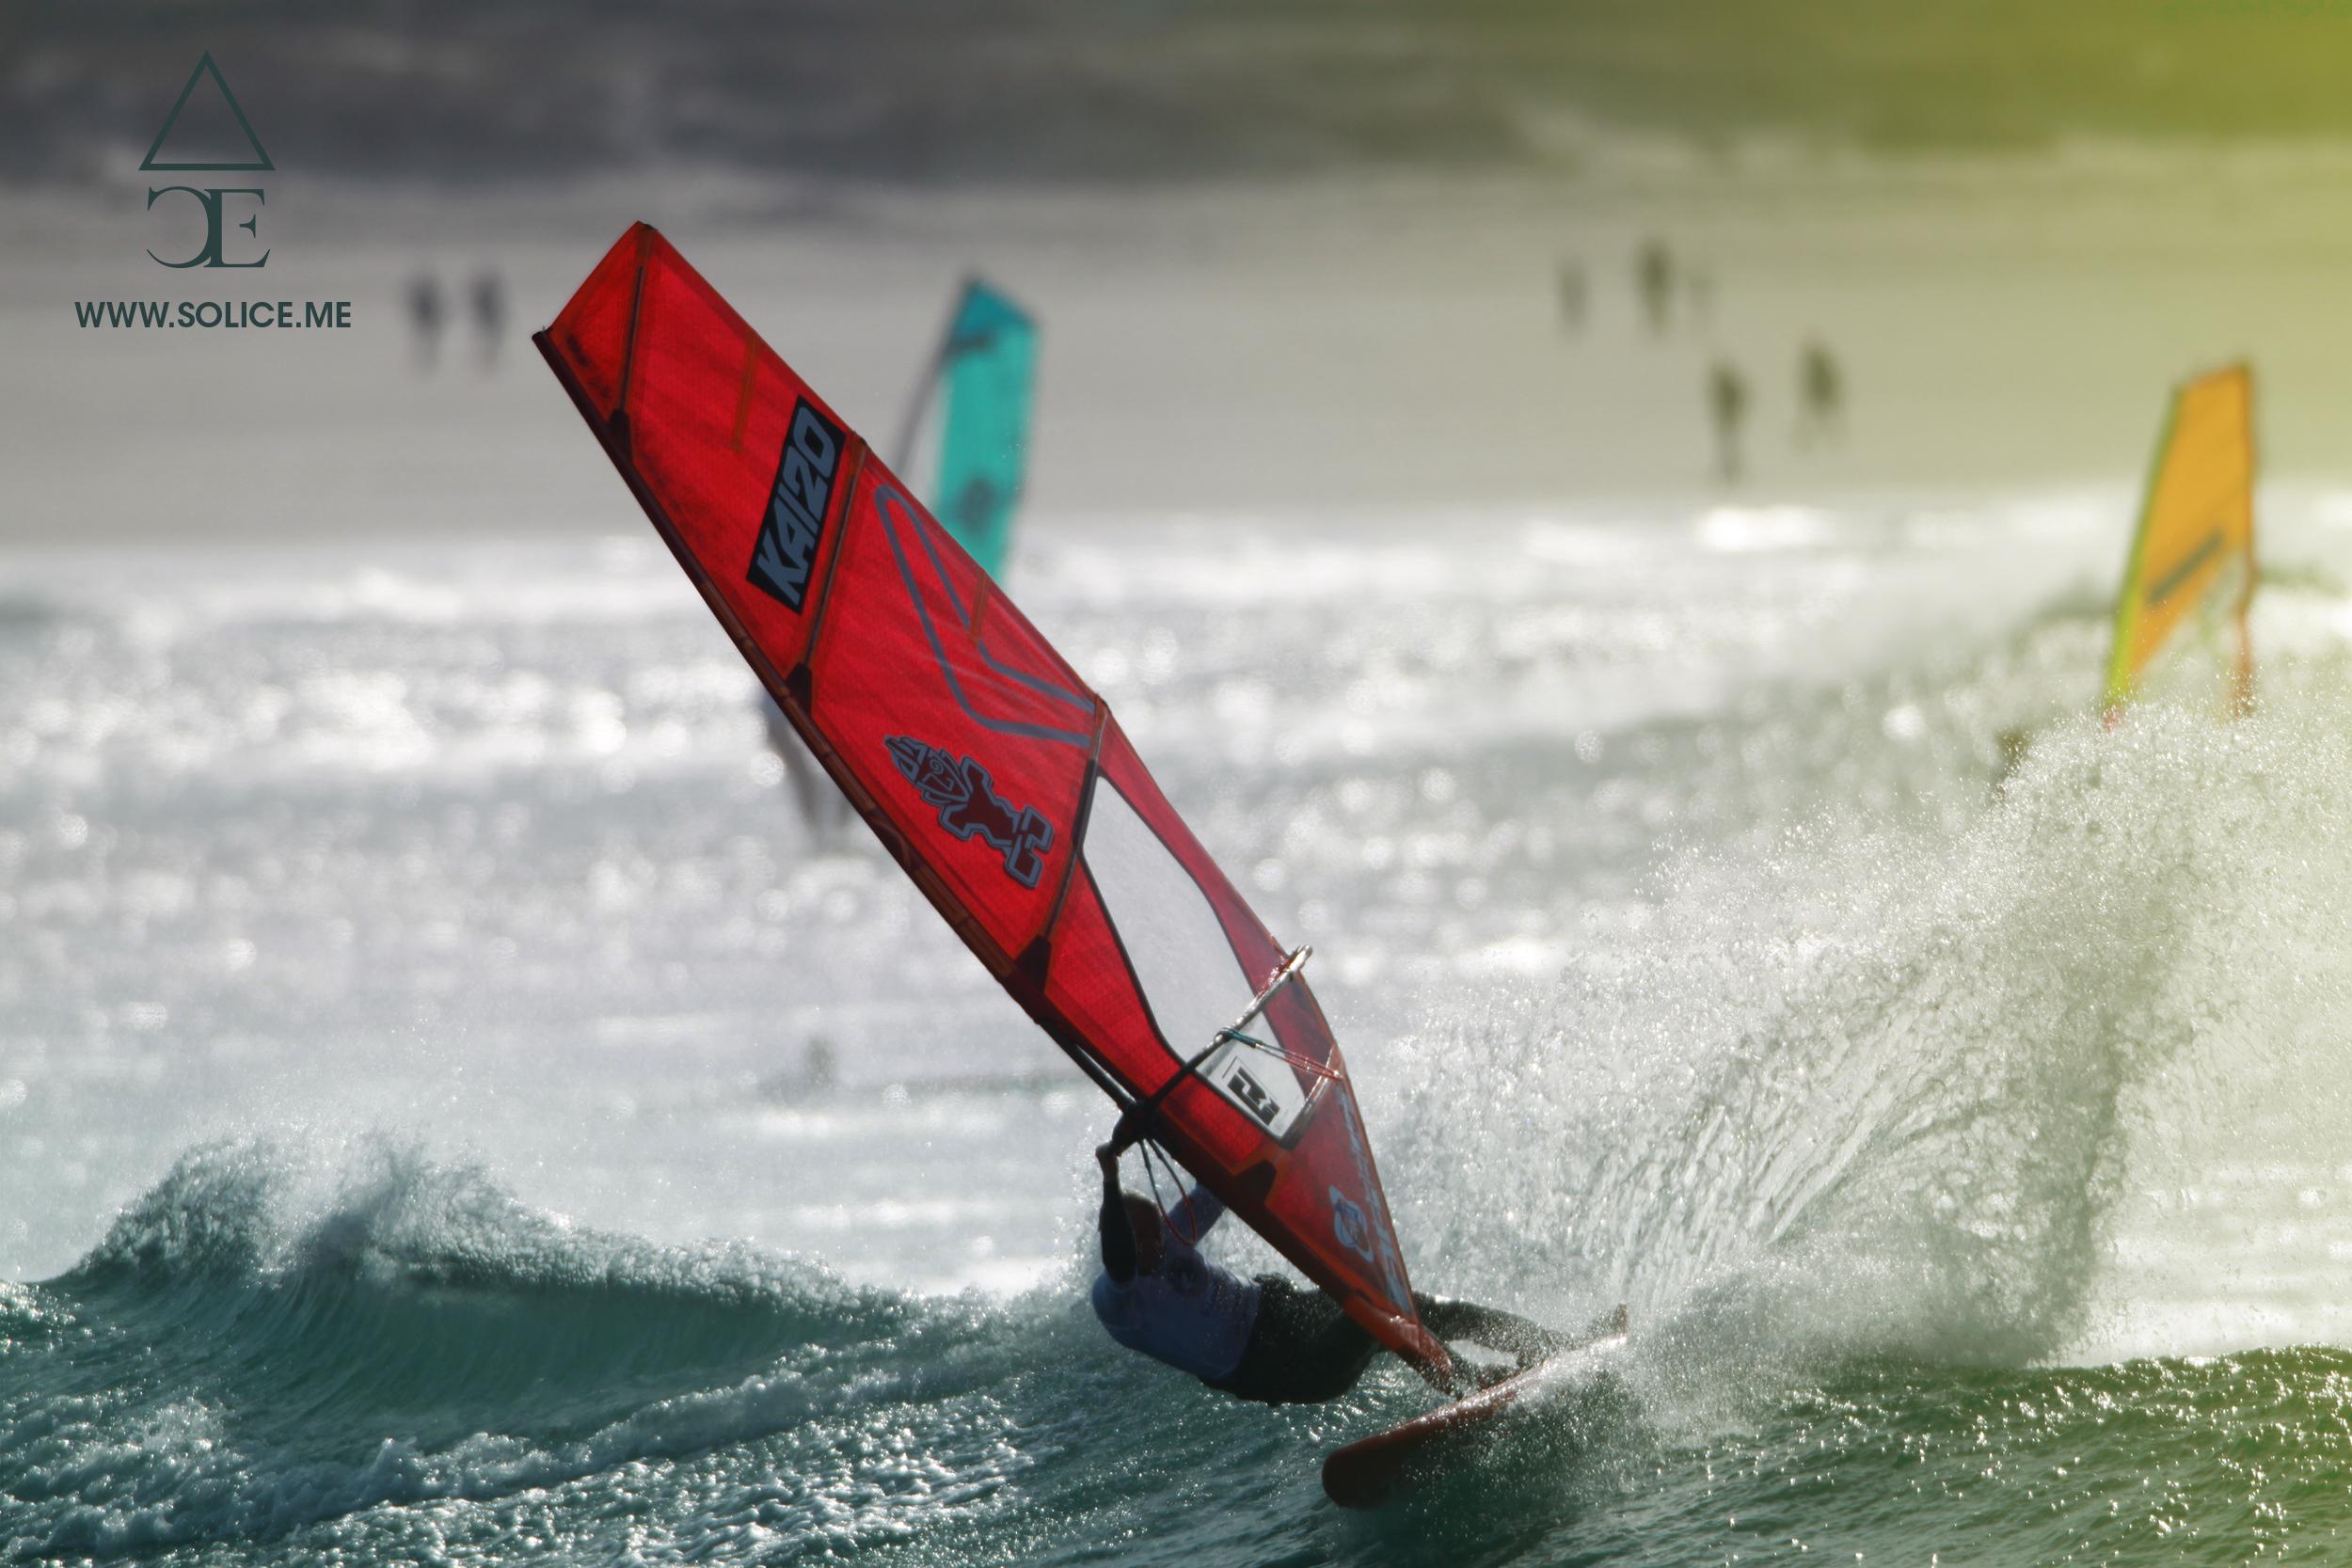 jaeger-stone-windsurf